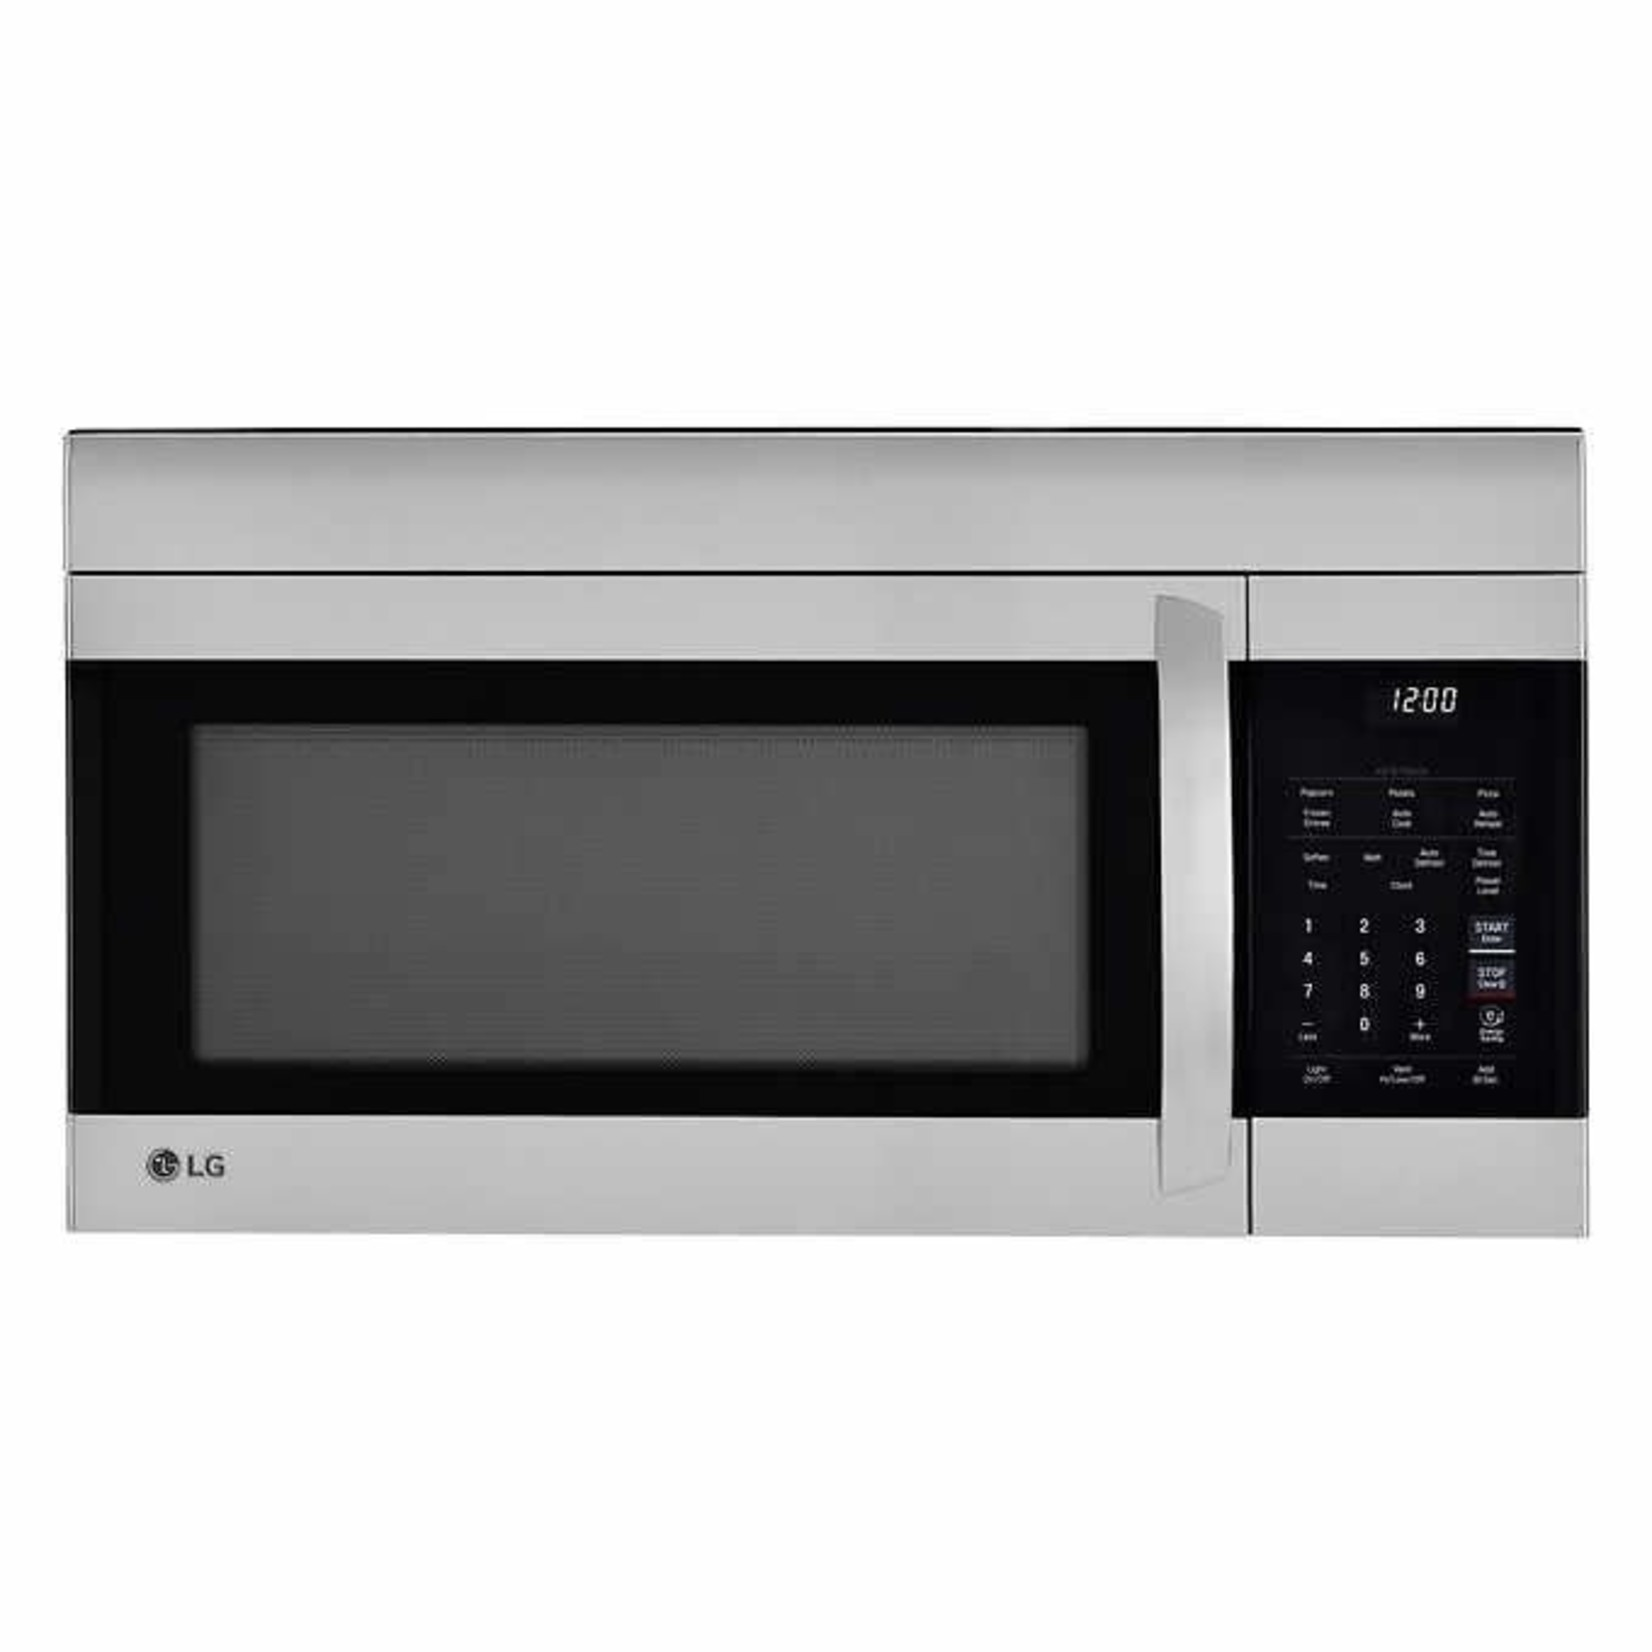 LG LMV1751ST 1.7-cu ft Over-the-Range Microwave (Stainless Steel)